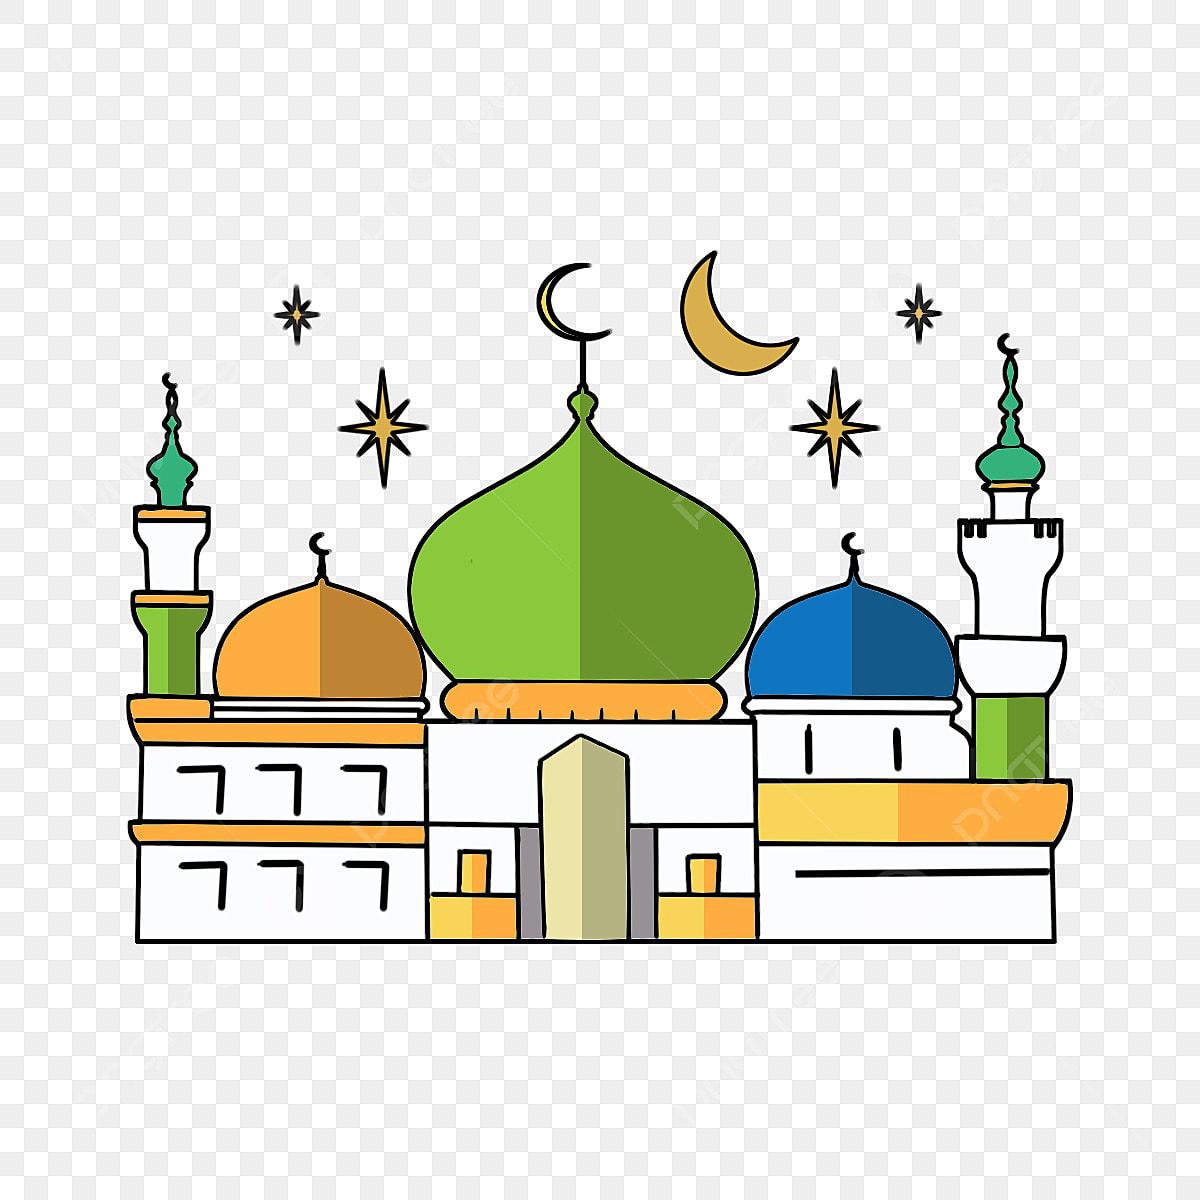 Cartoon Ramadan Mosque Elements Islam Islamic Cartoon PNG